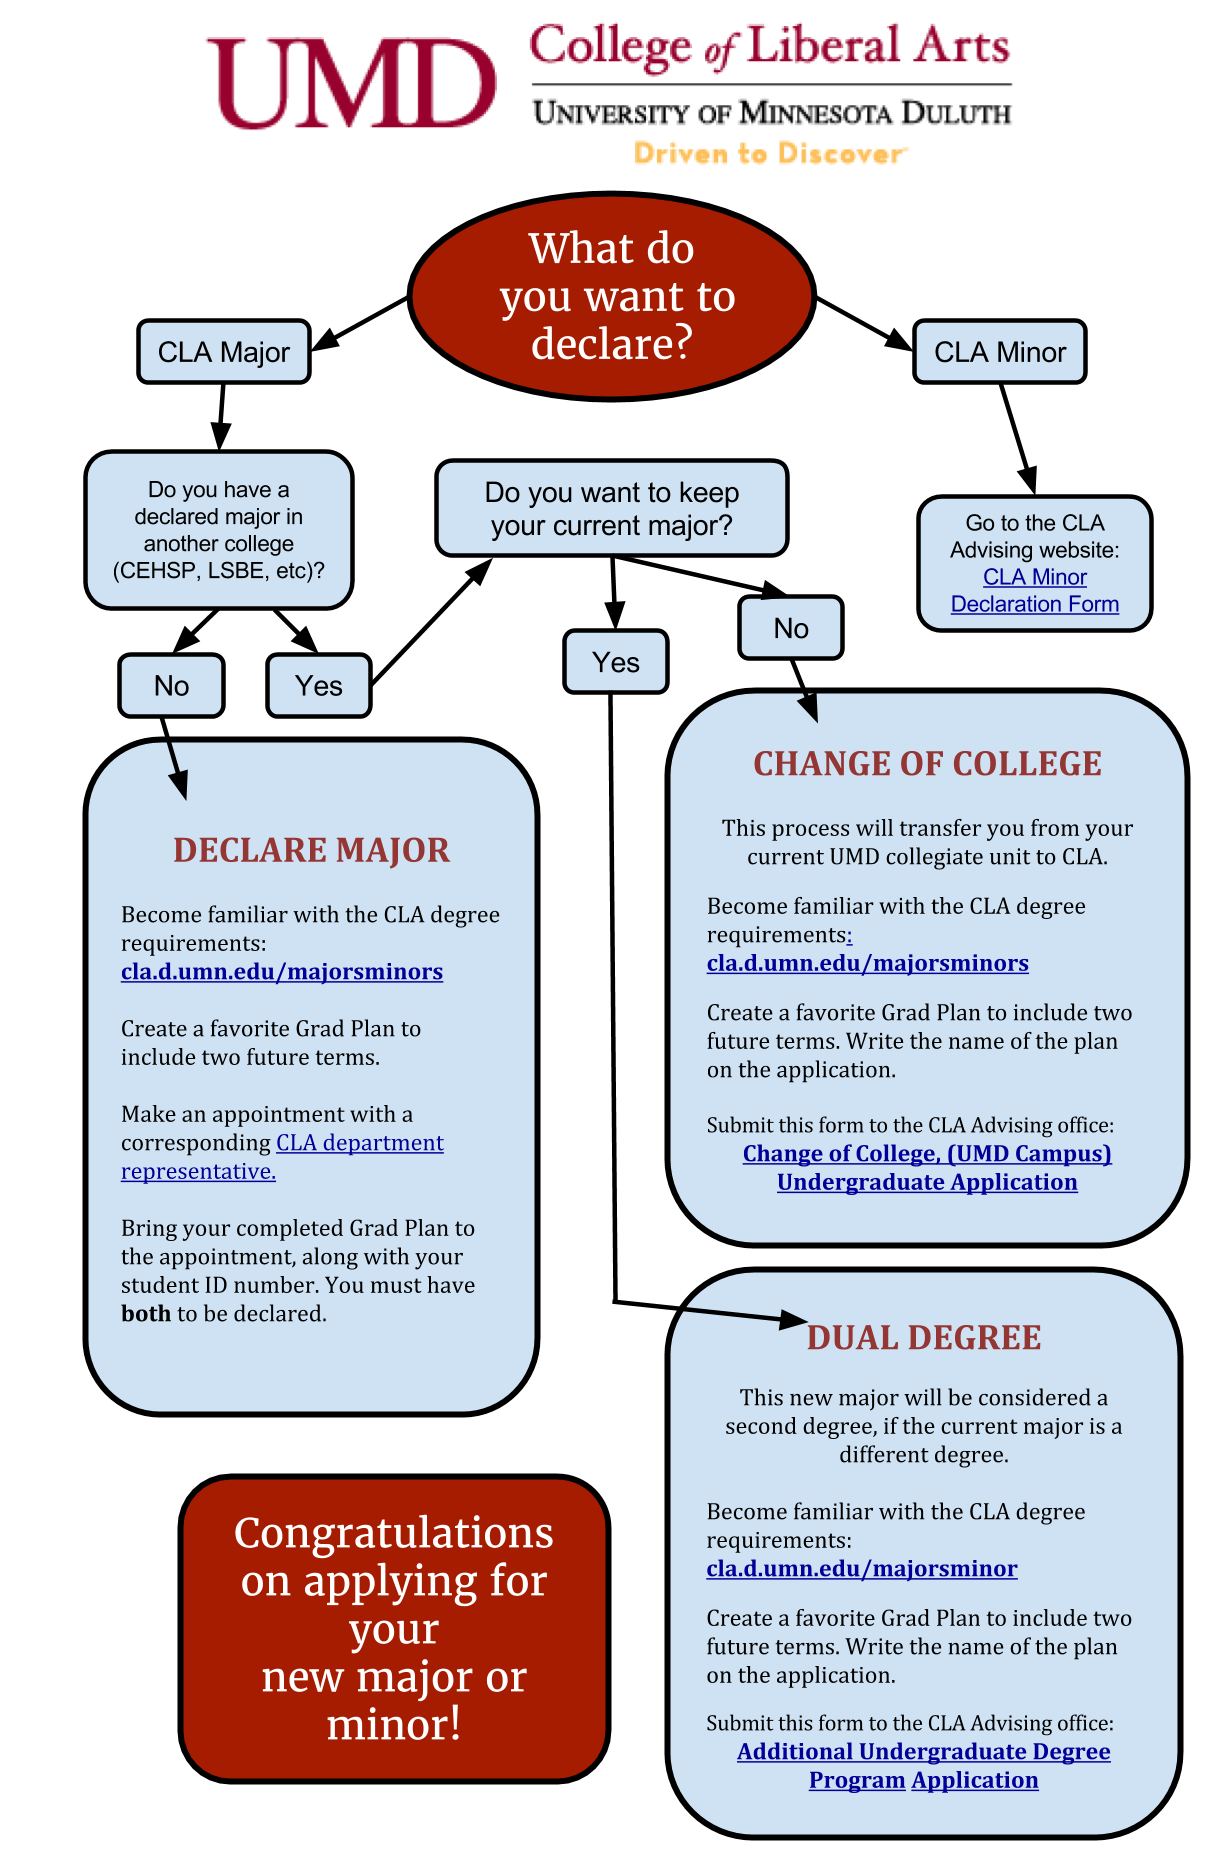 Declare A Major | College of Liberal Arts